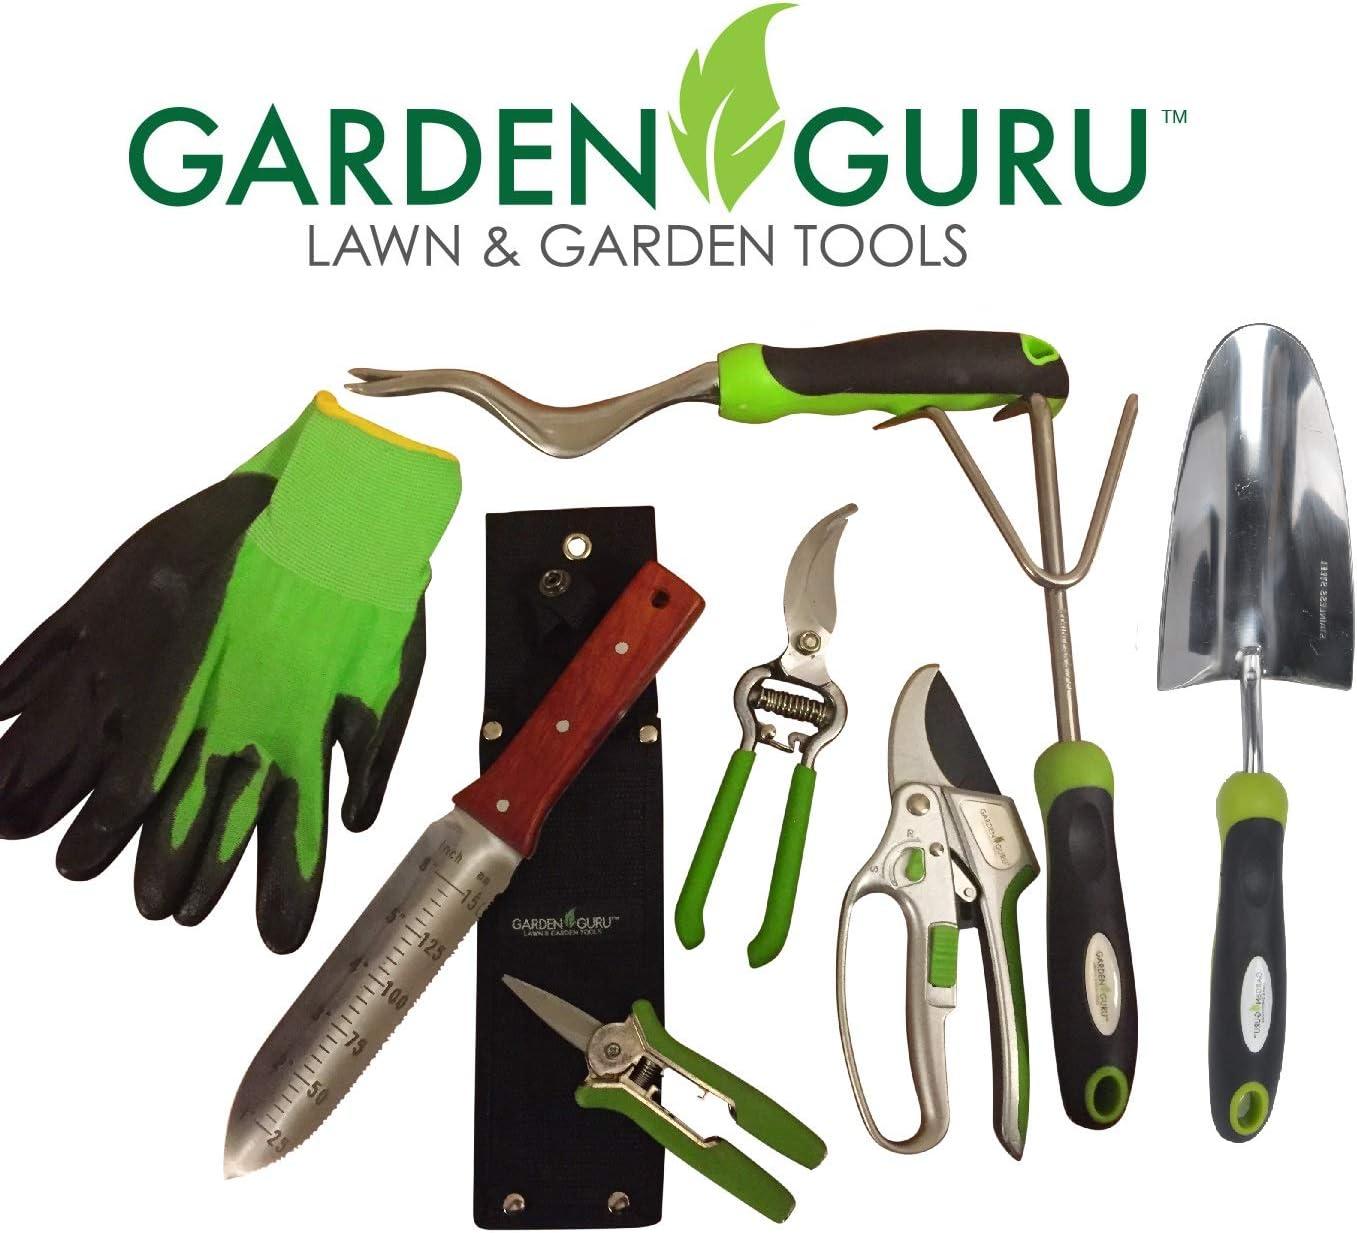 Die Cast Aluminum Weed Puller with Ergonomic Handle for Planting Garden Guru Hand Weeder Flower and Vegetable Care in Lawn Garden Yard Weeding Rust Resistant